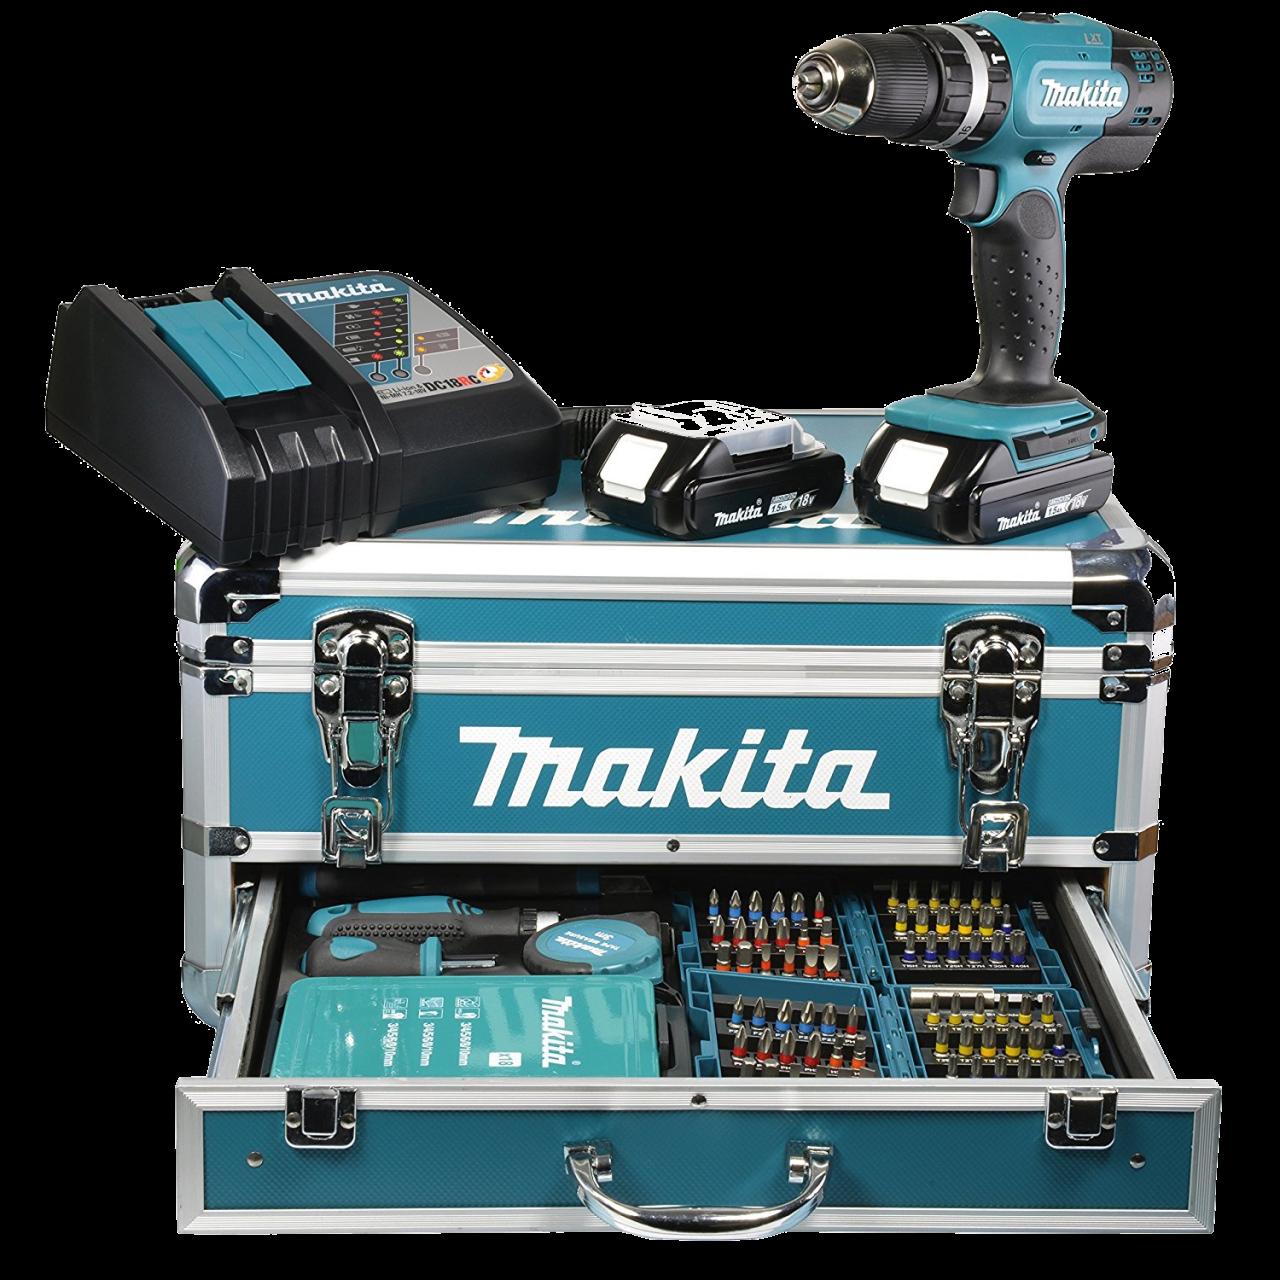 Makita DHP453RFX2 Set Akku-Schlagbohrschrauber 18V, 42 Nm, 0-1.300 min-1, inkl. 2 x Akku, Ladegerät,